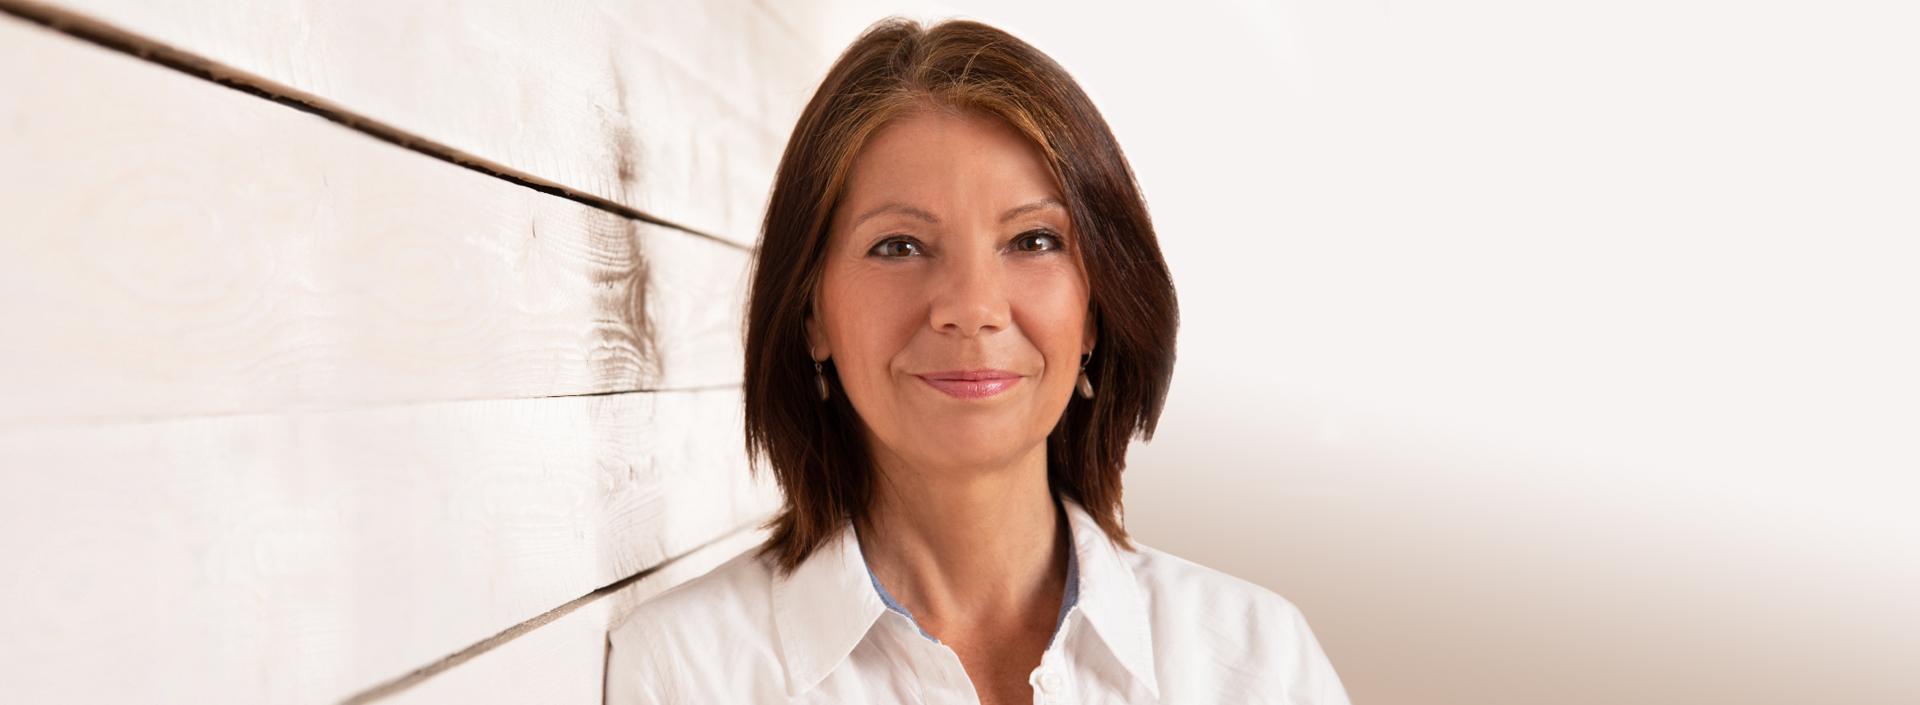 Jeanette Fischer Yoga & Ernährungsberatung Lüneburg